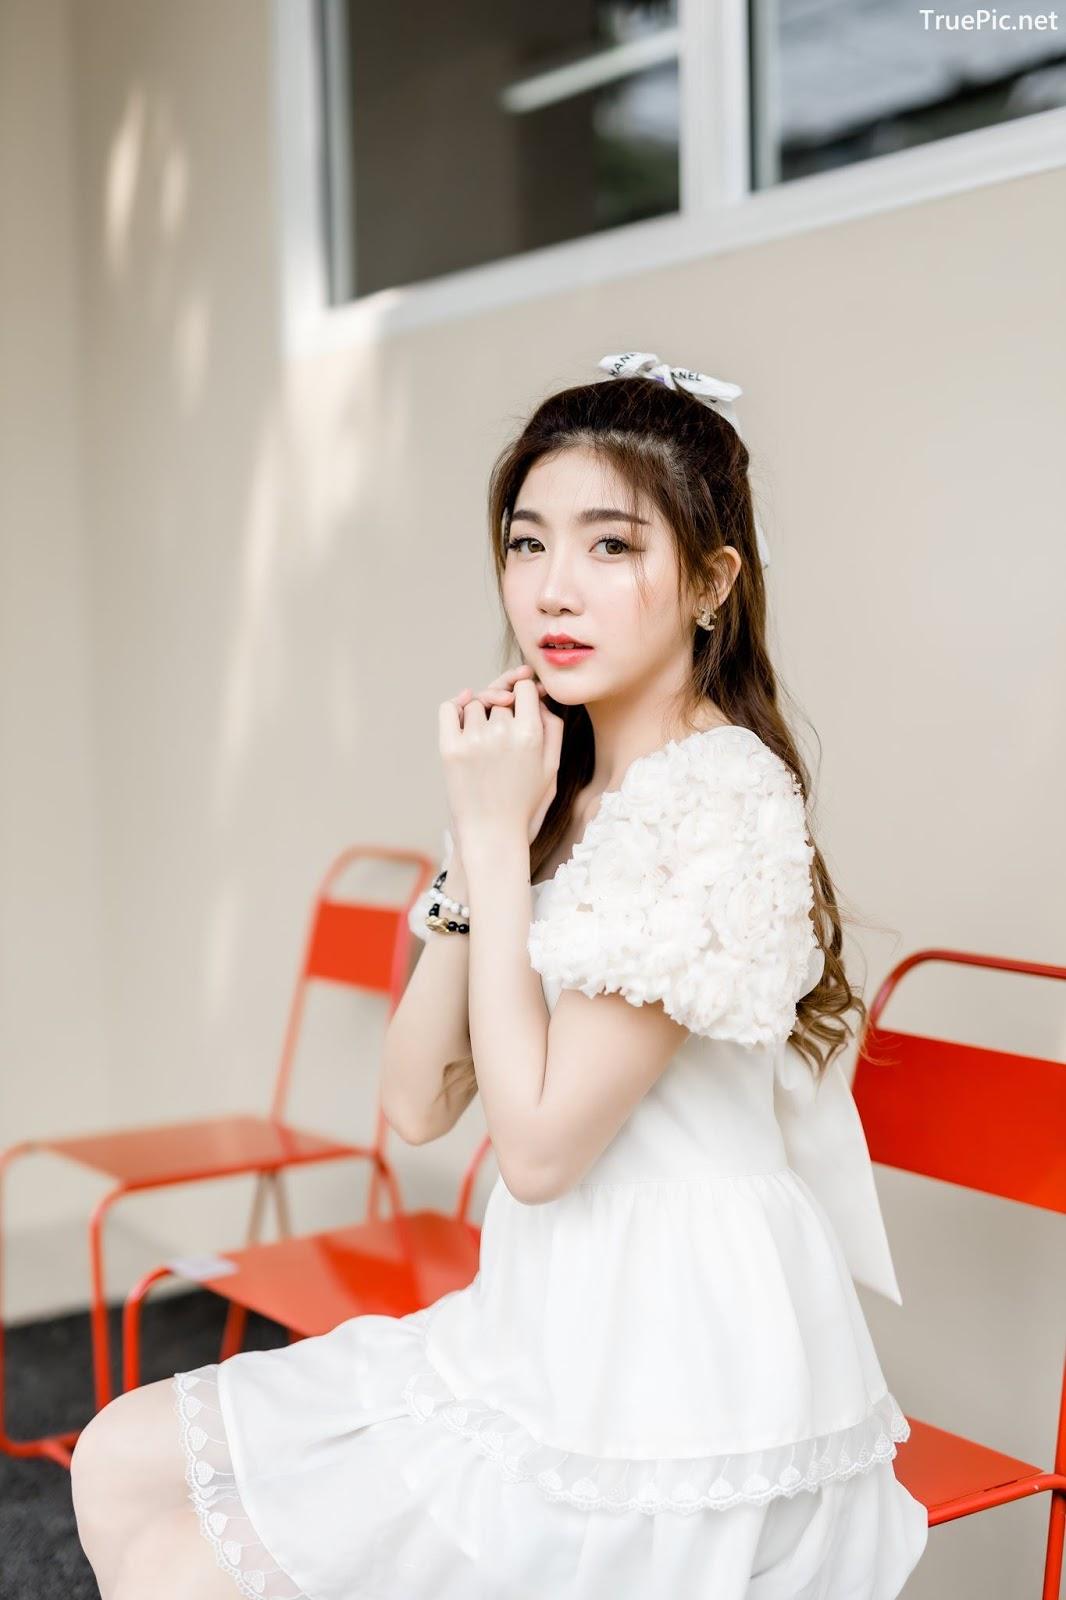 Image Thailand Model - Sasi Ngiunwan - Barbie Doll Smile - TruePic.net - Picture-15